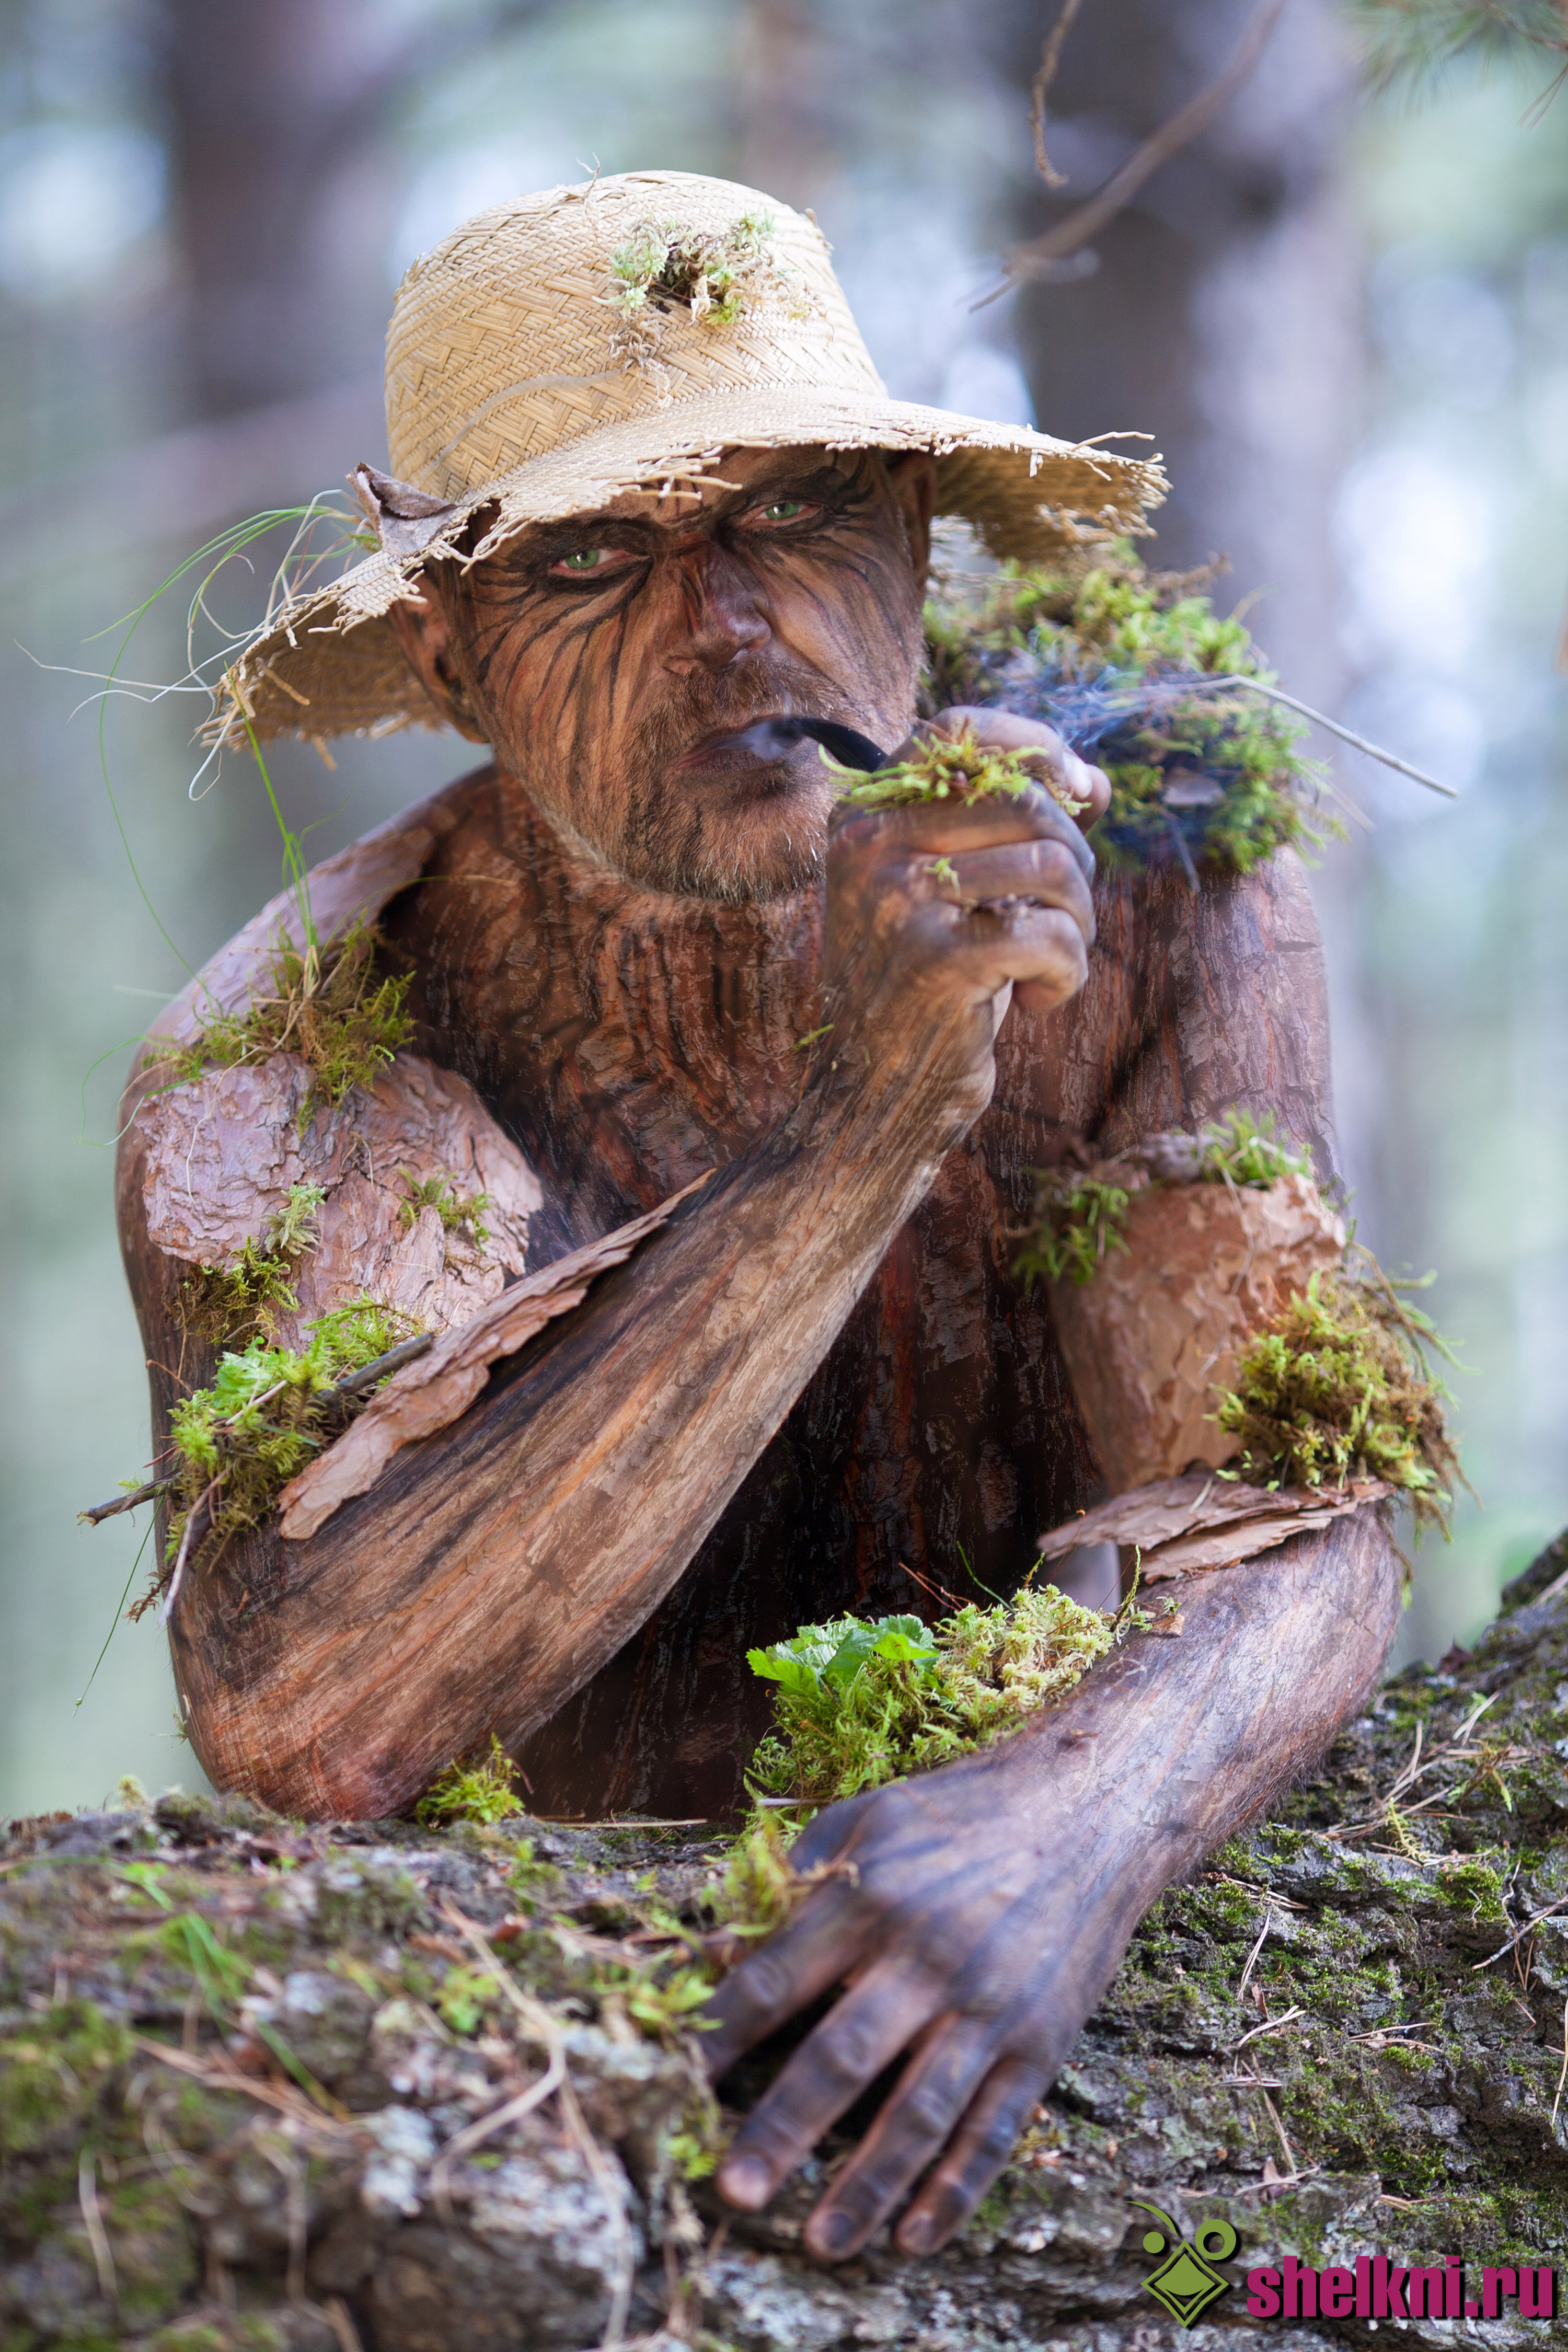 Картинка или изображение лесовичка